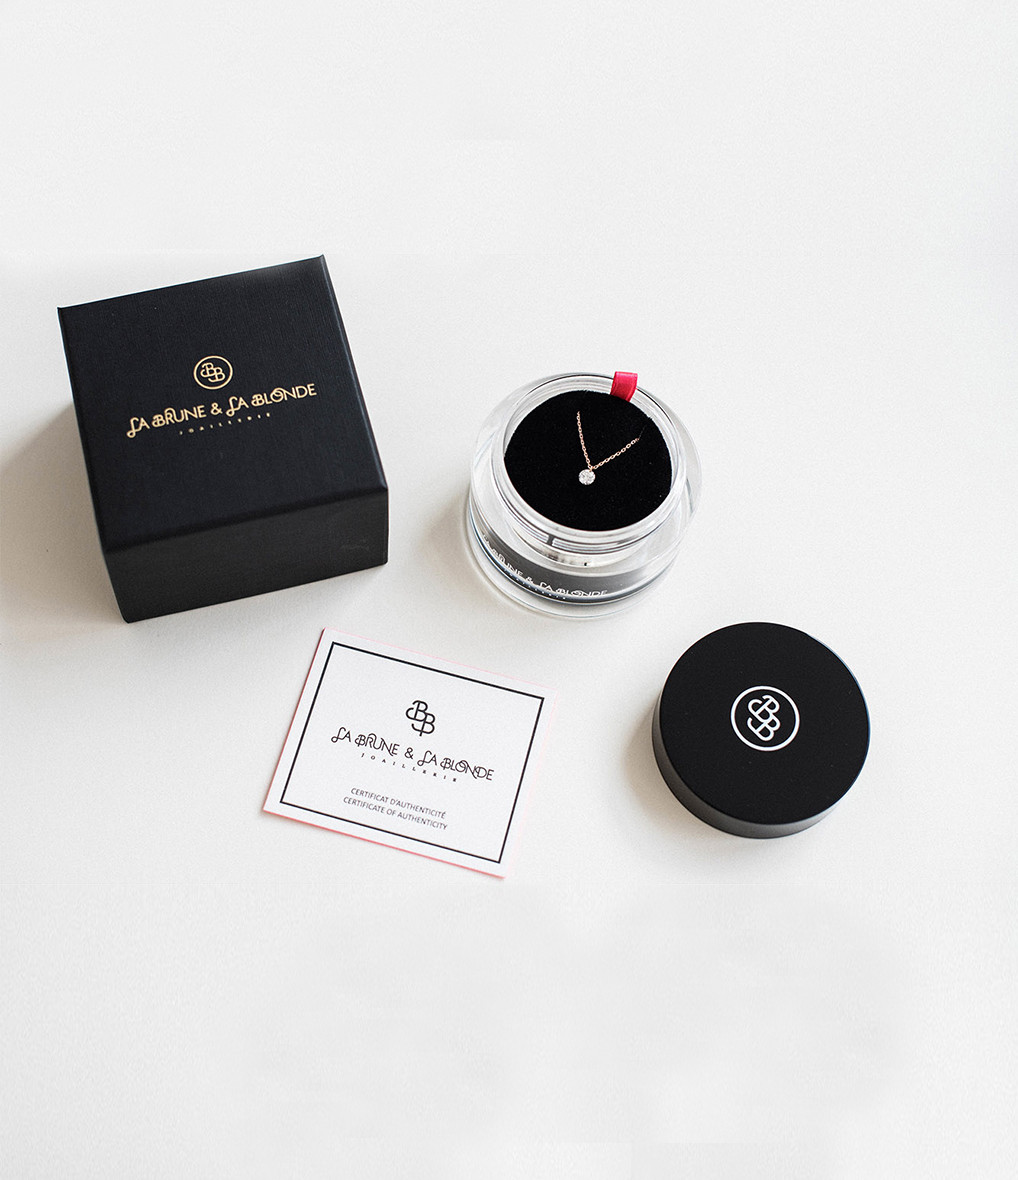 LA BRUNE & LA BLONDE - Bracelet Confetti 5 Tsavorites Vert Or Jaune